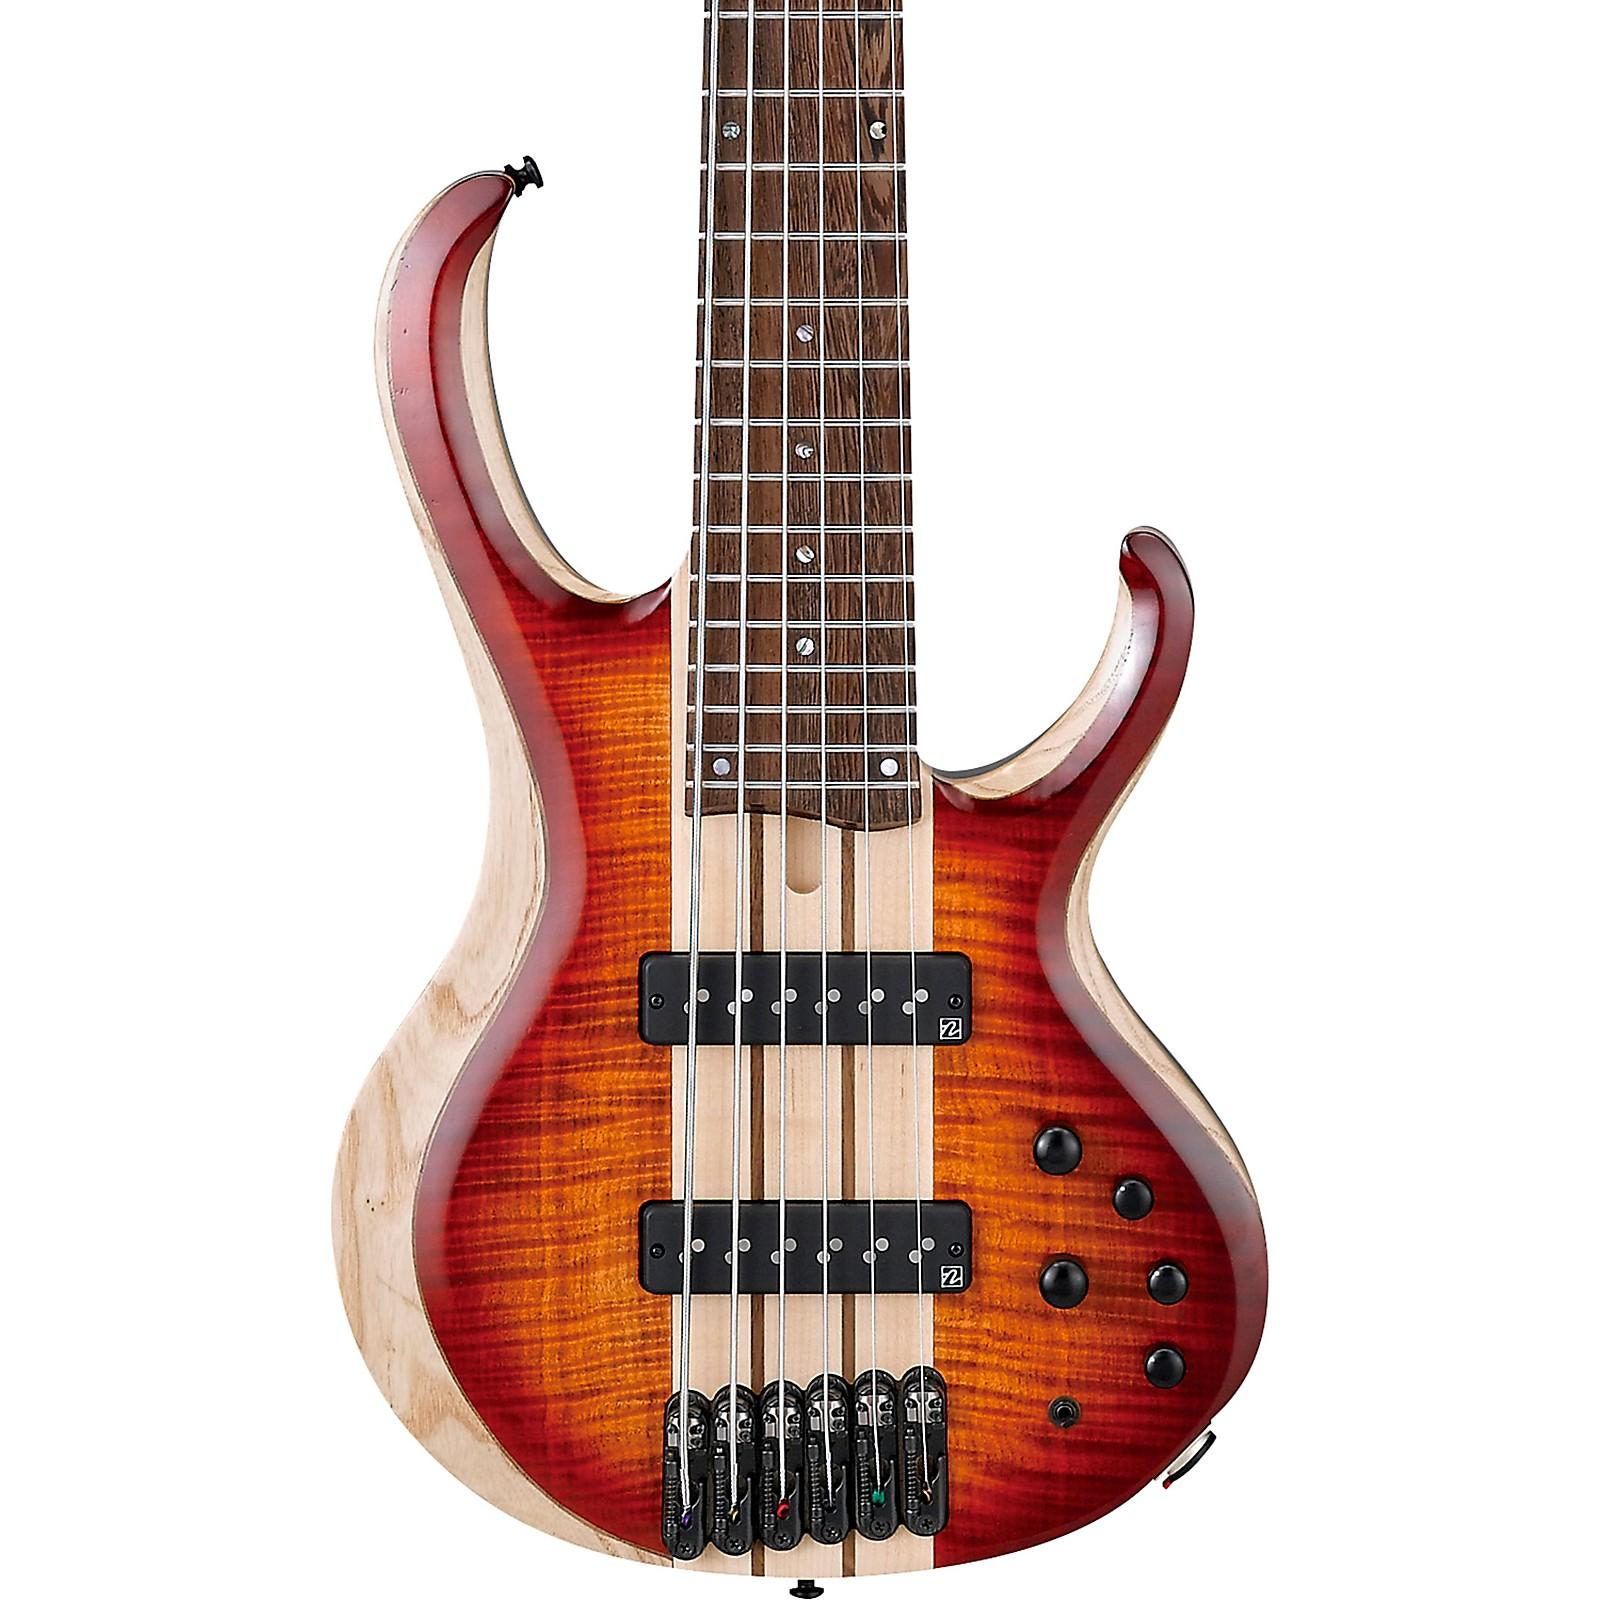 Ibanez BTB 20th Anniversary BTB20TH6 6-String Electric Bass